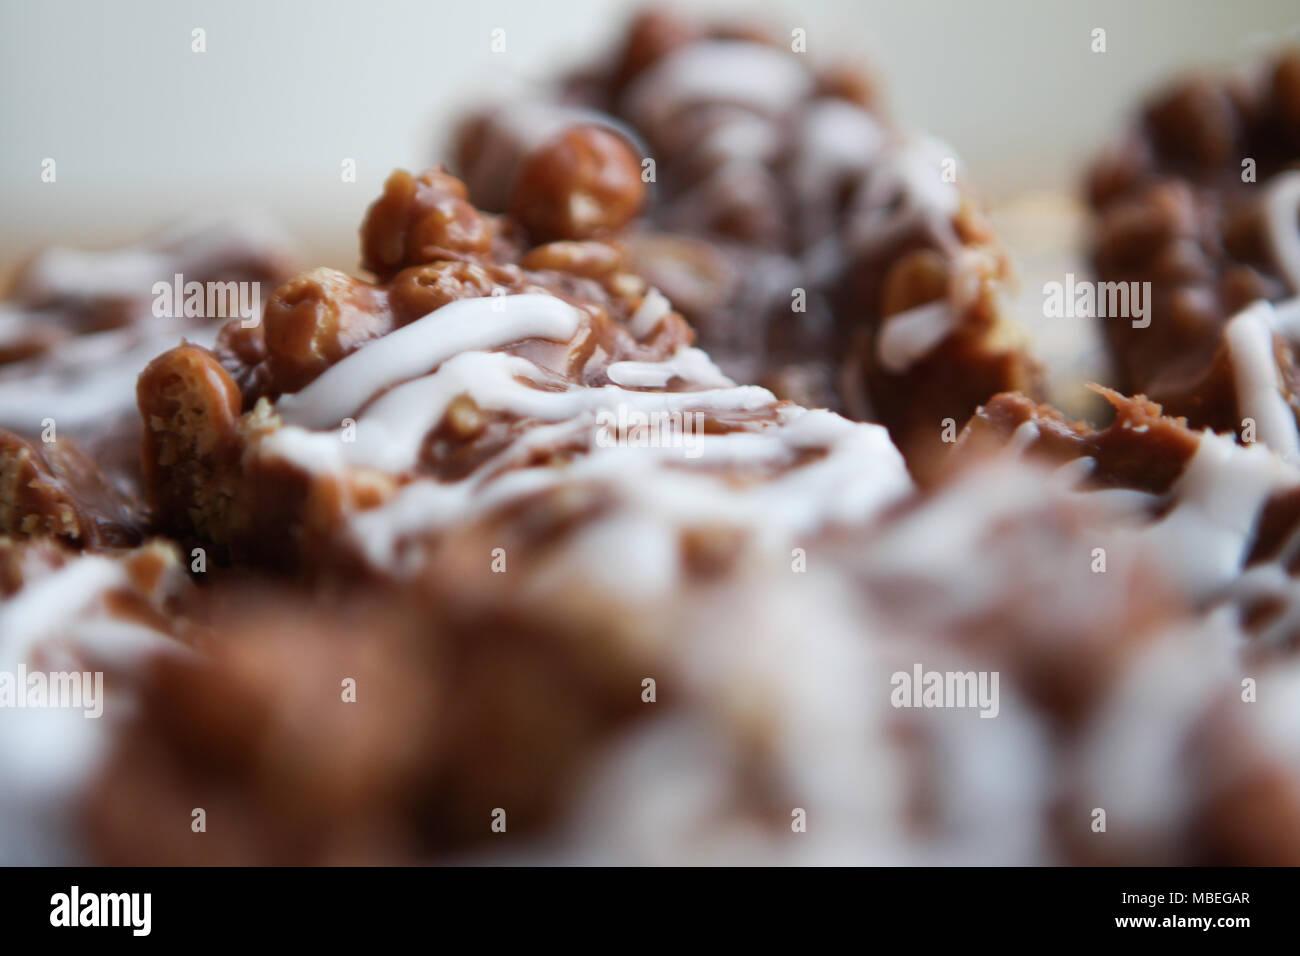 Mums gooey chocolate oat bars. - Stock Image